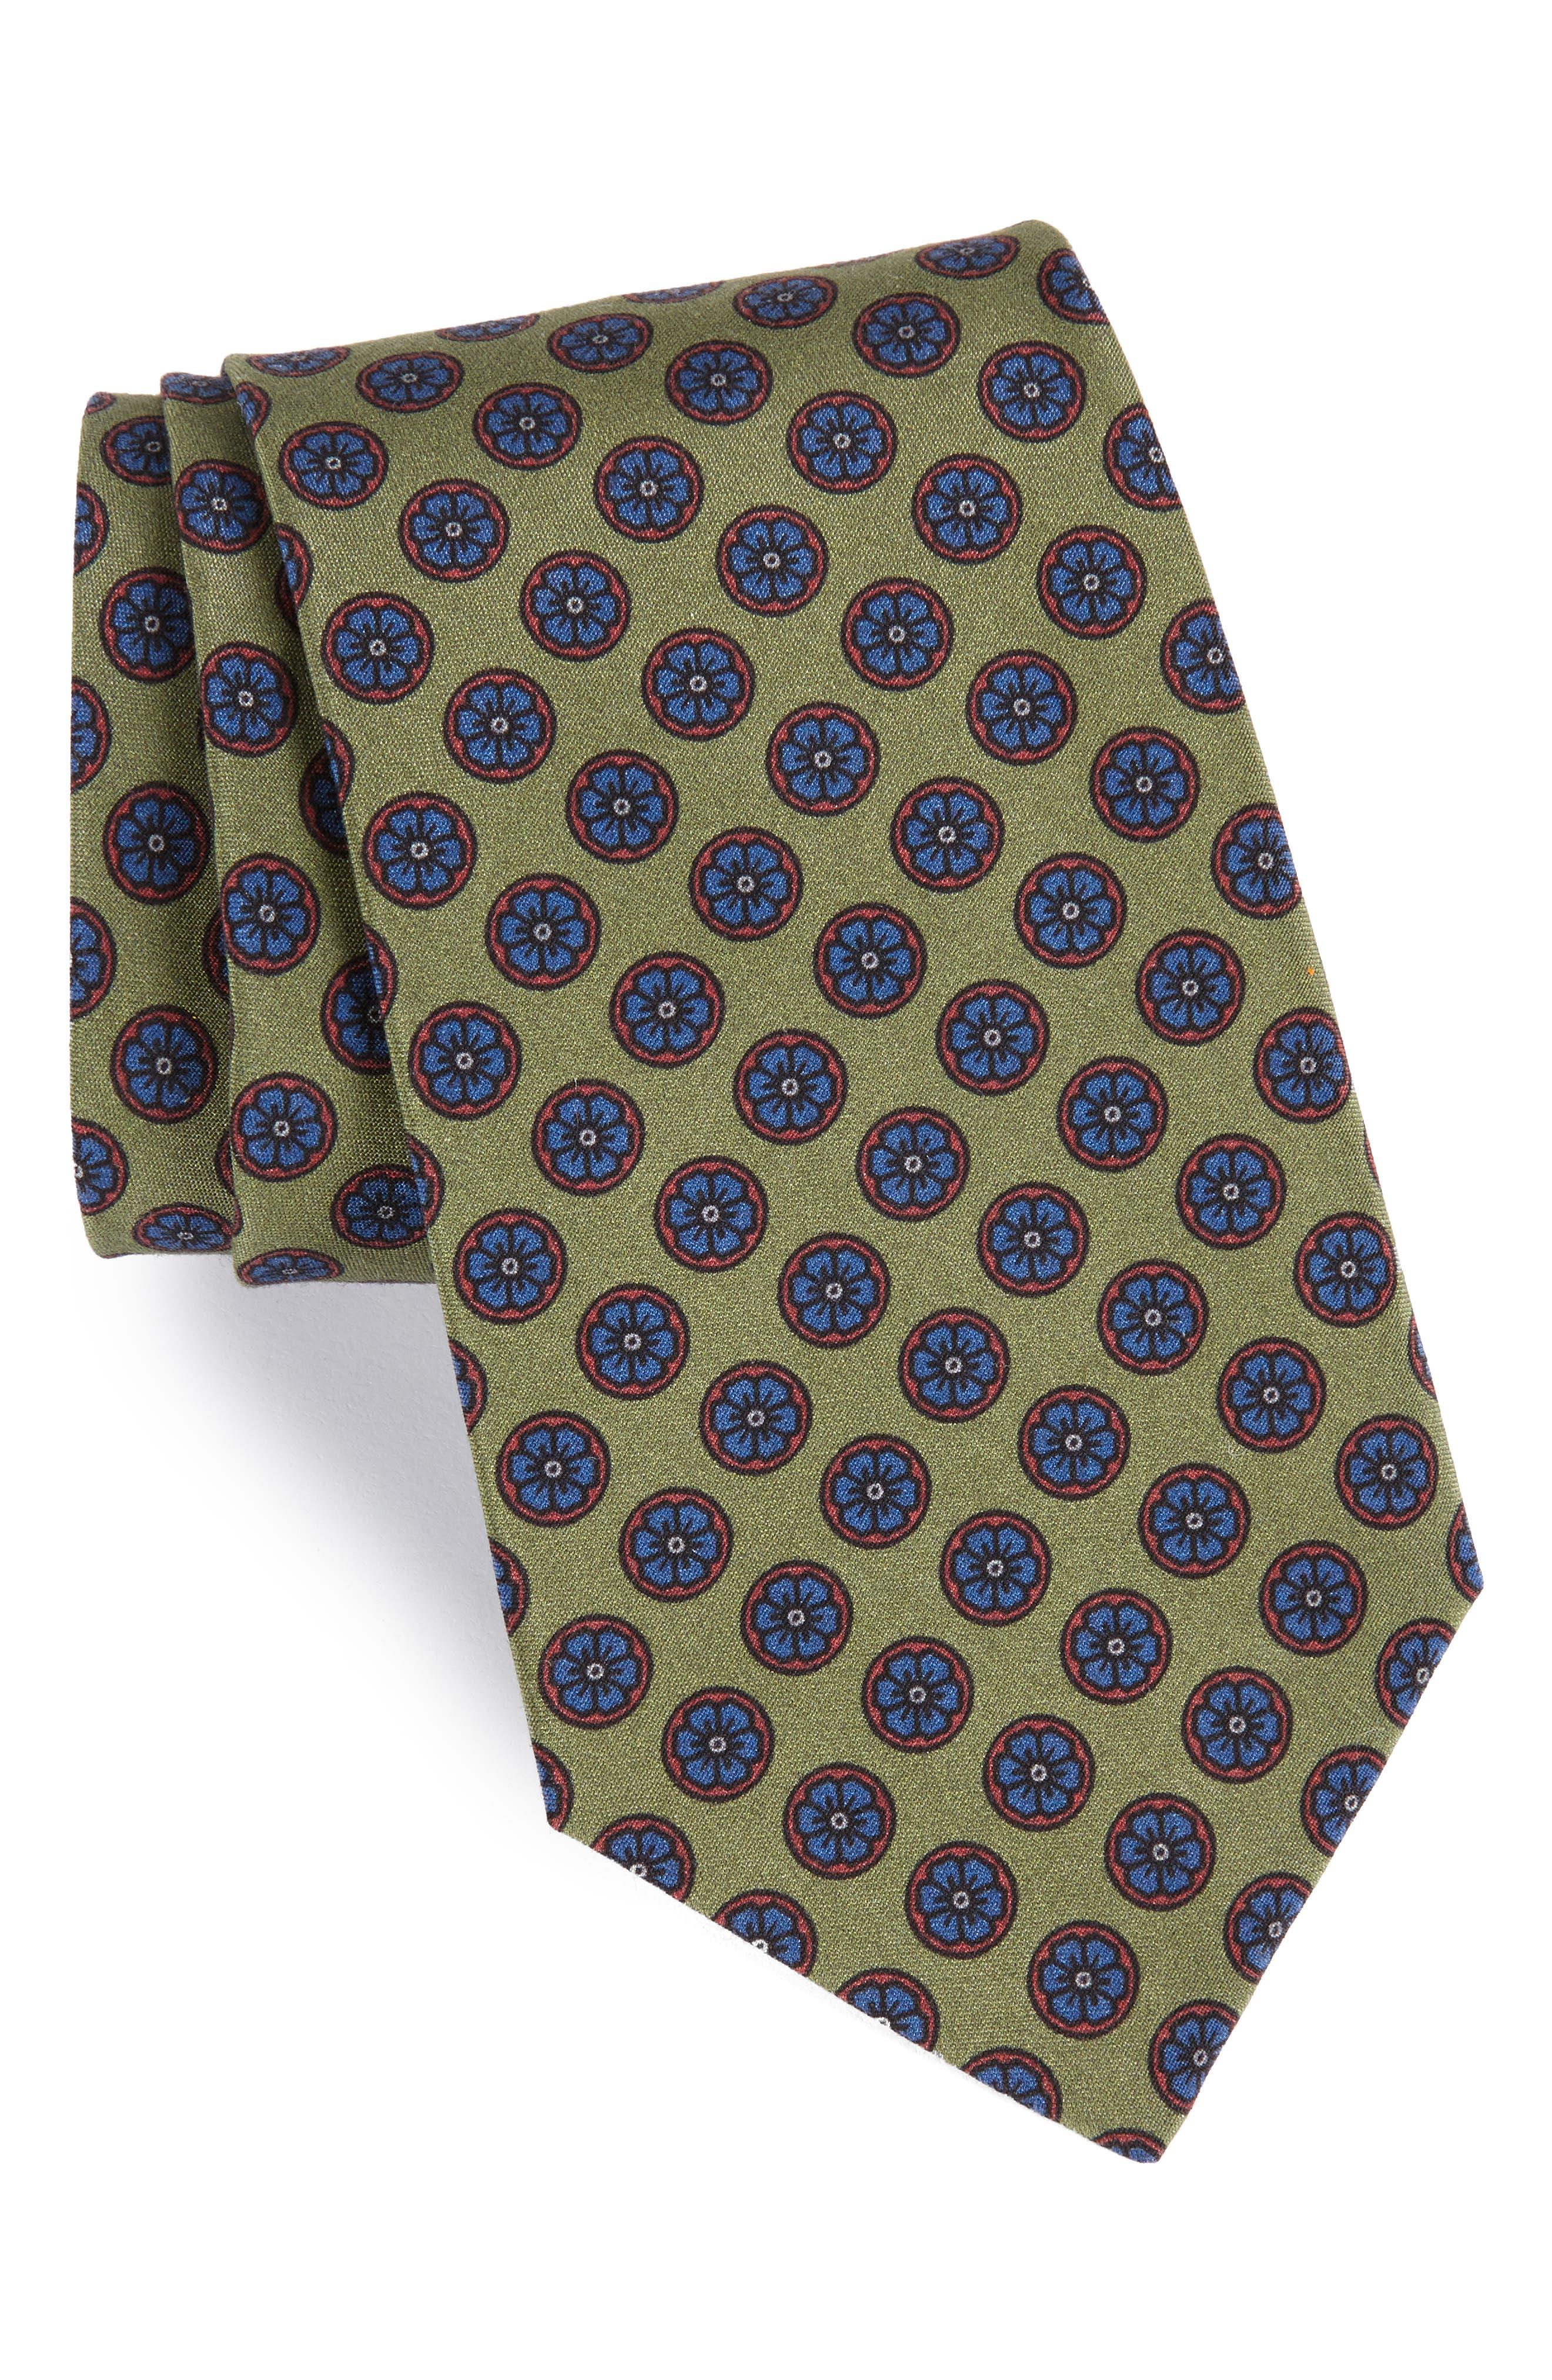 MICHAEL BASTIAN Floral Medallion Silk Tie